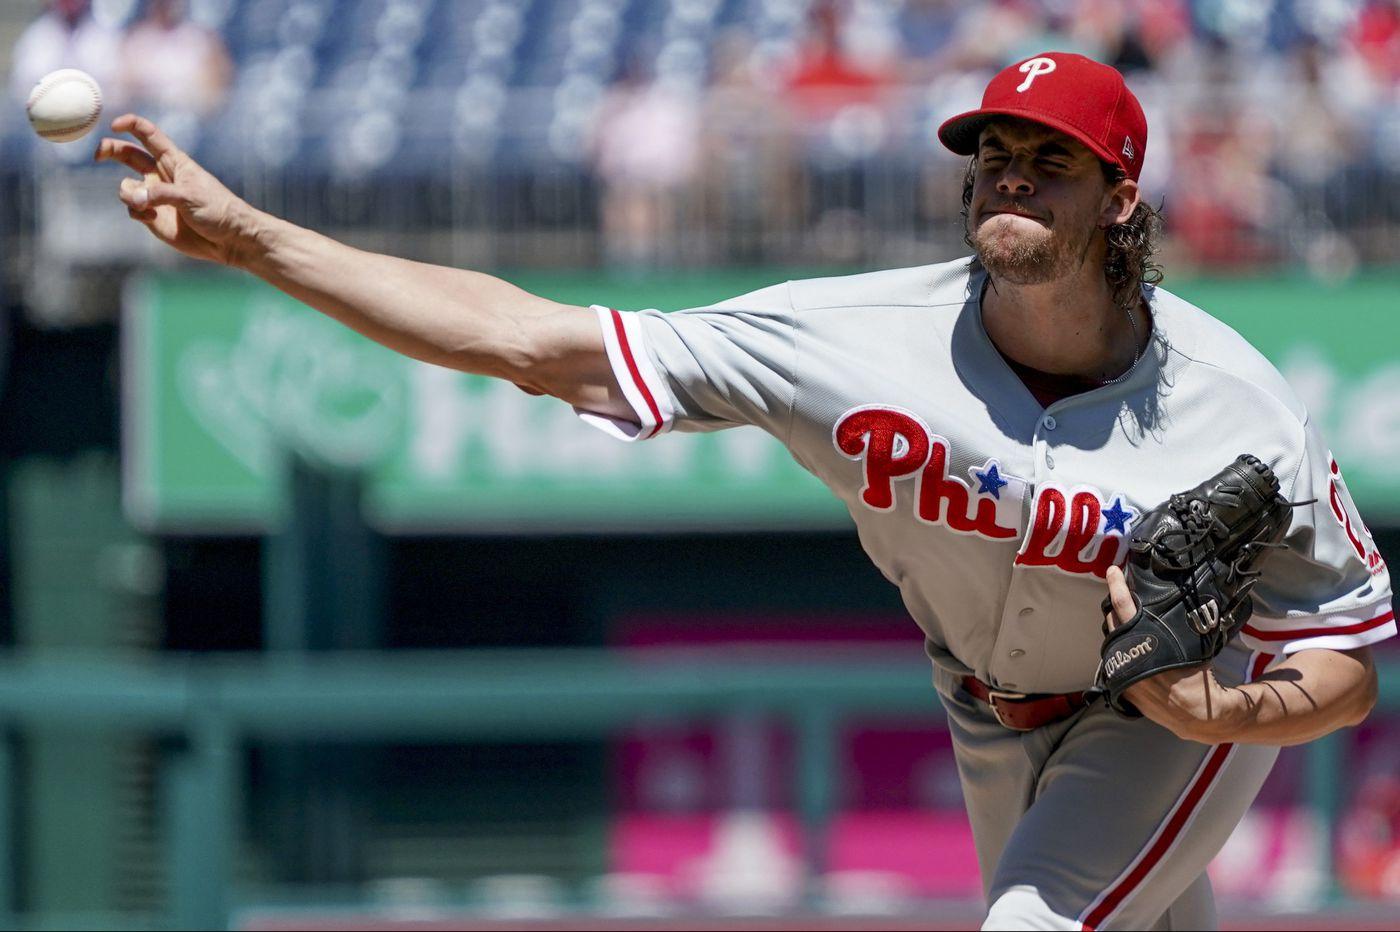 Phillies snap four-game skid on Aaron Nola's gem